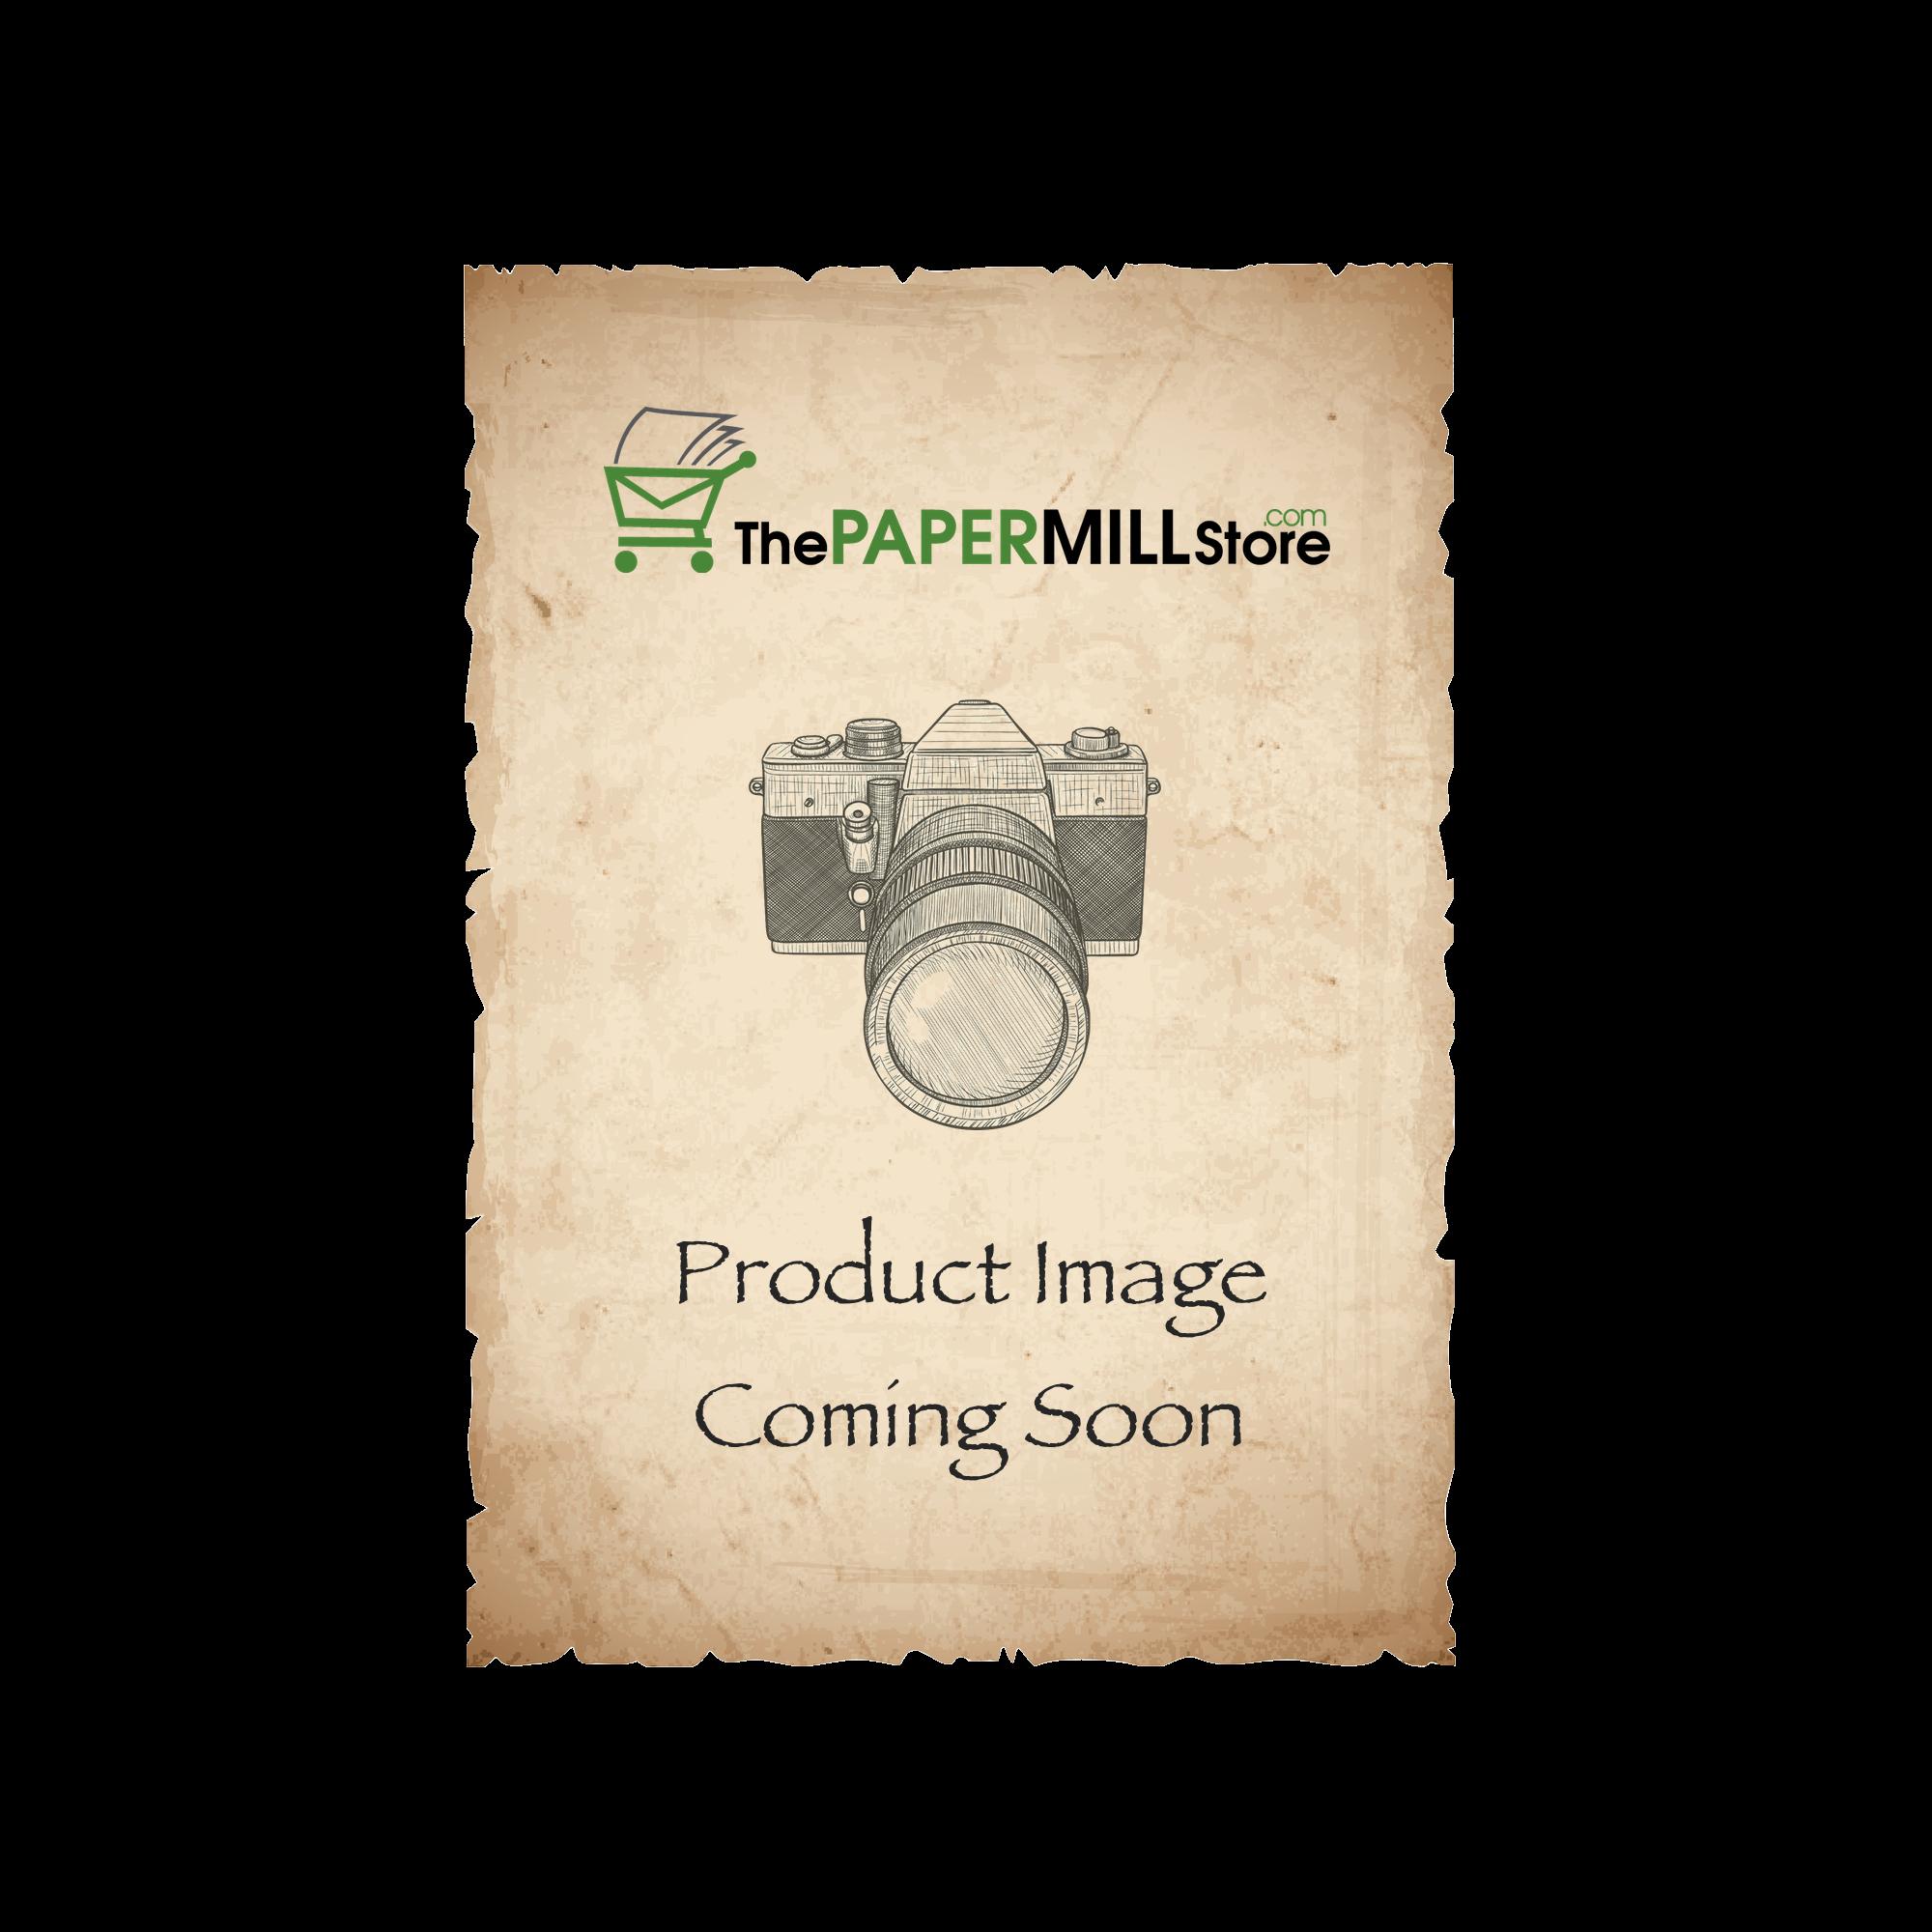 Pocket Folder - Presentation Folders 10 pt Cover HP Indigo & NexPress Certified C/1S White Glossy Finish 12 x 18 Folder 50 per Package